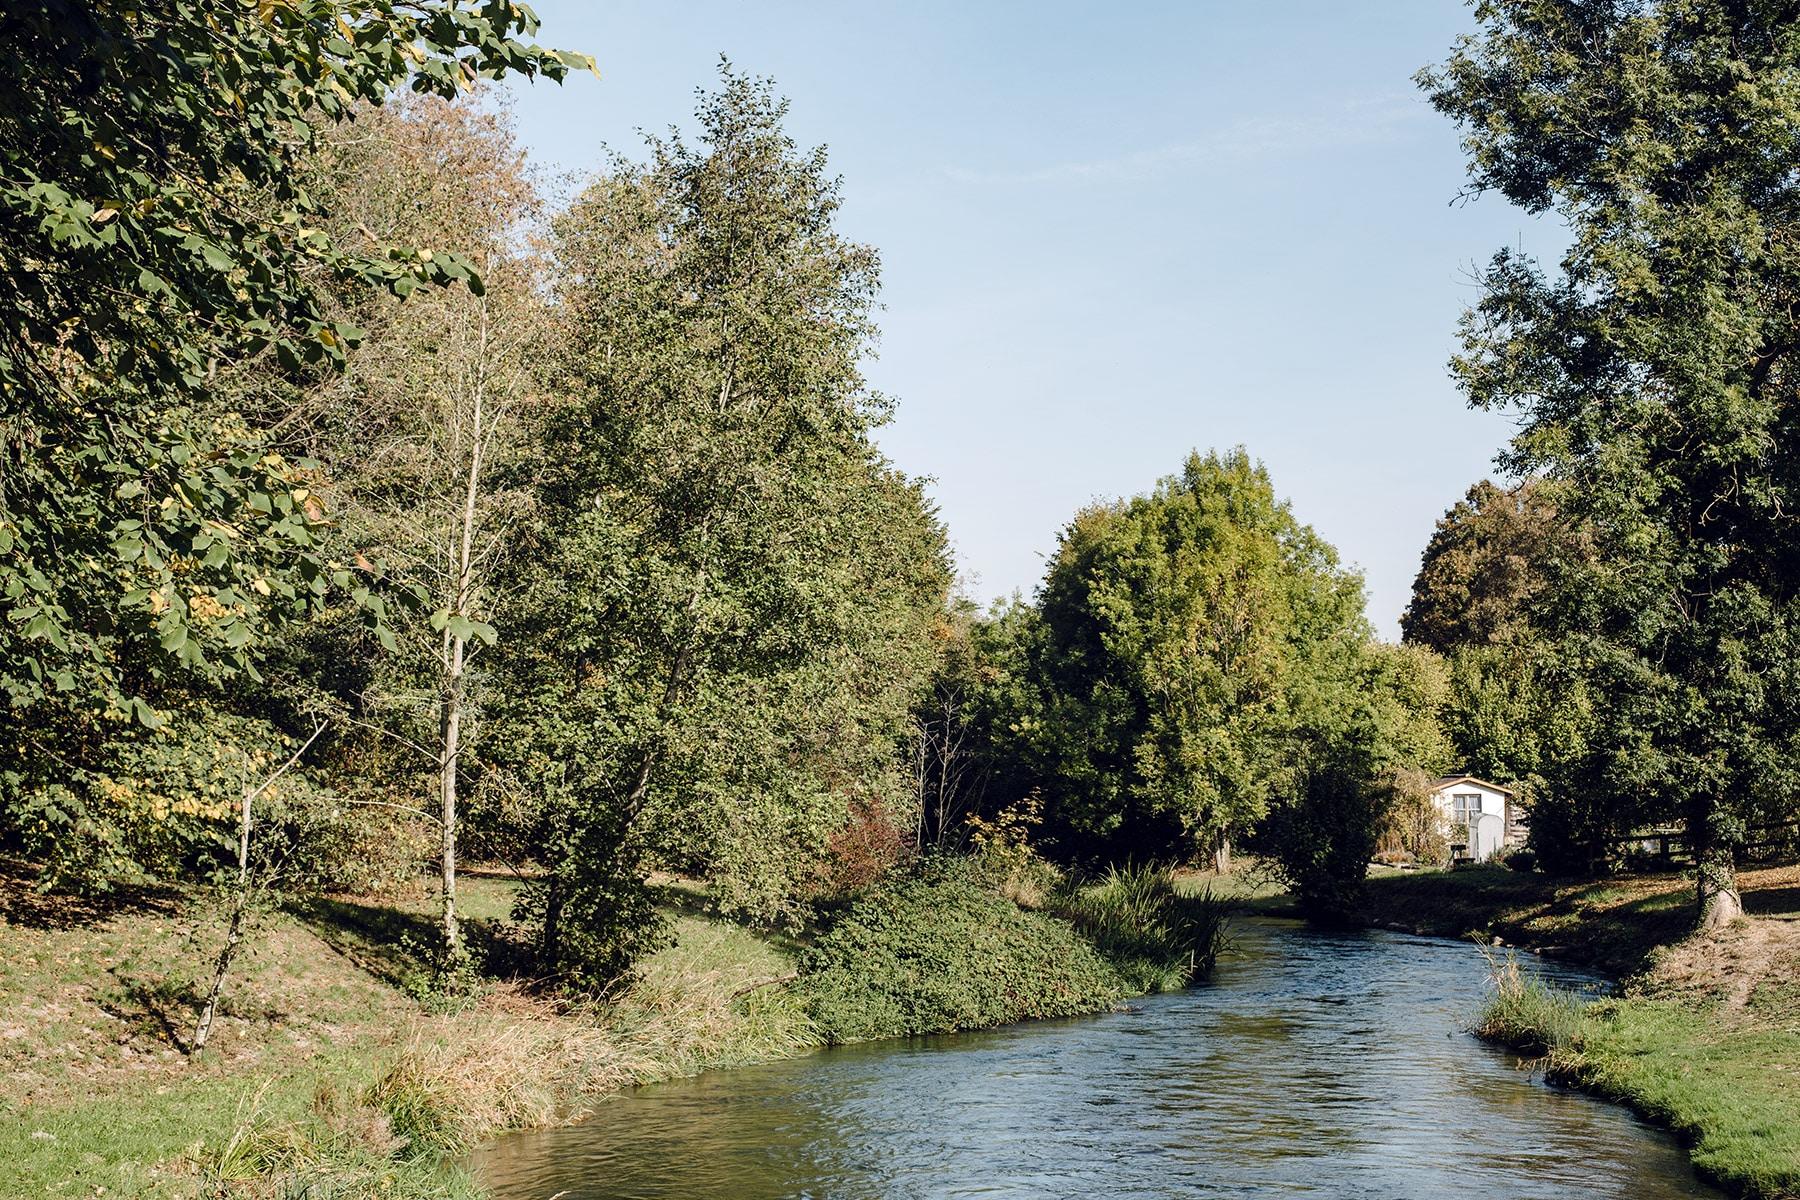 Promenade le long de l'ancienne Aar, dans les environs d'Aarberg